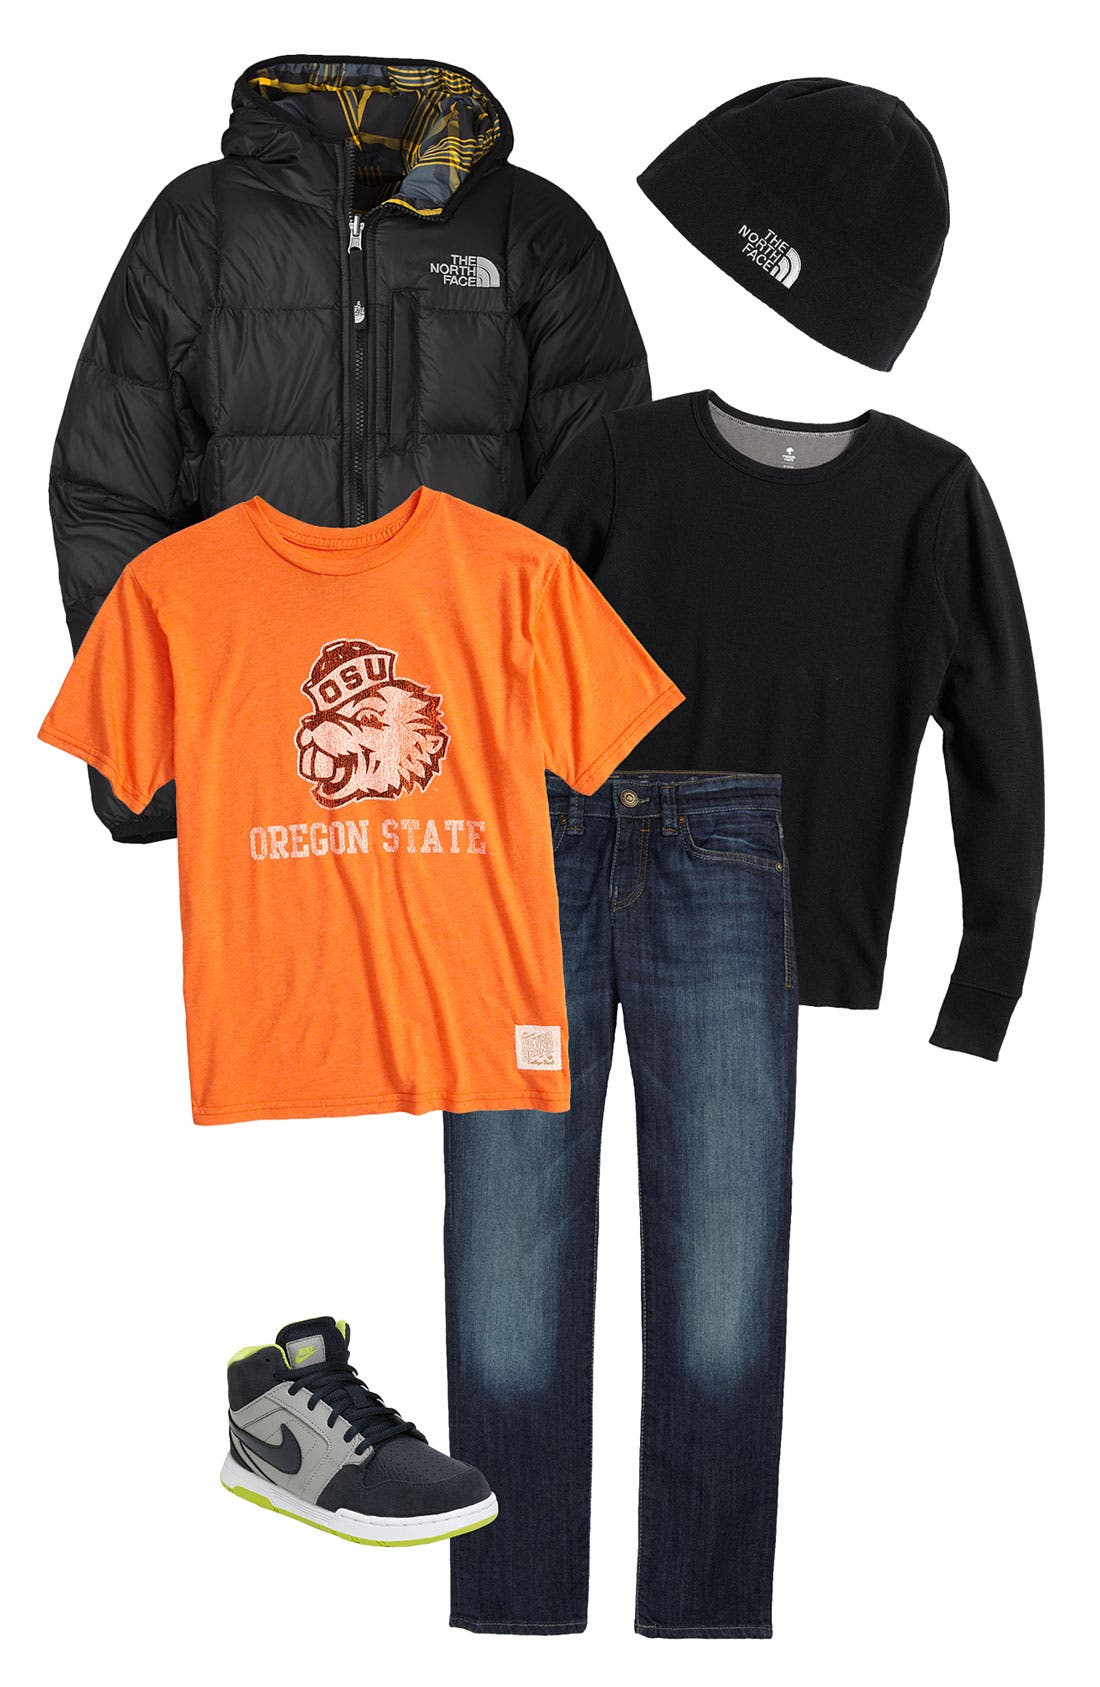 Main Image - Tucker + Tate Thermal Shirt, Retro Brand T-Shirt & The North Face Down Jacket (Big Boys)